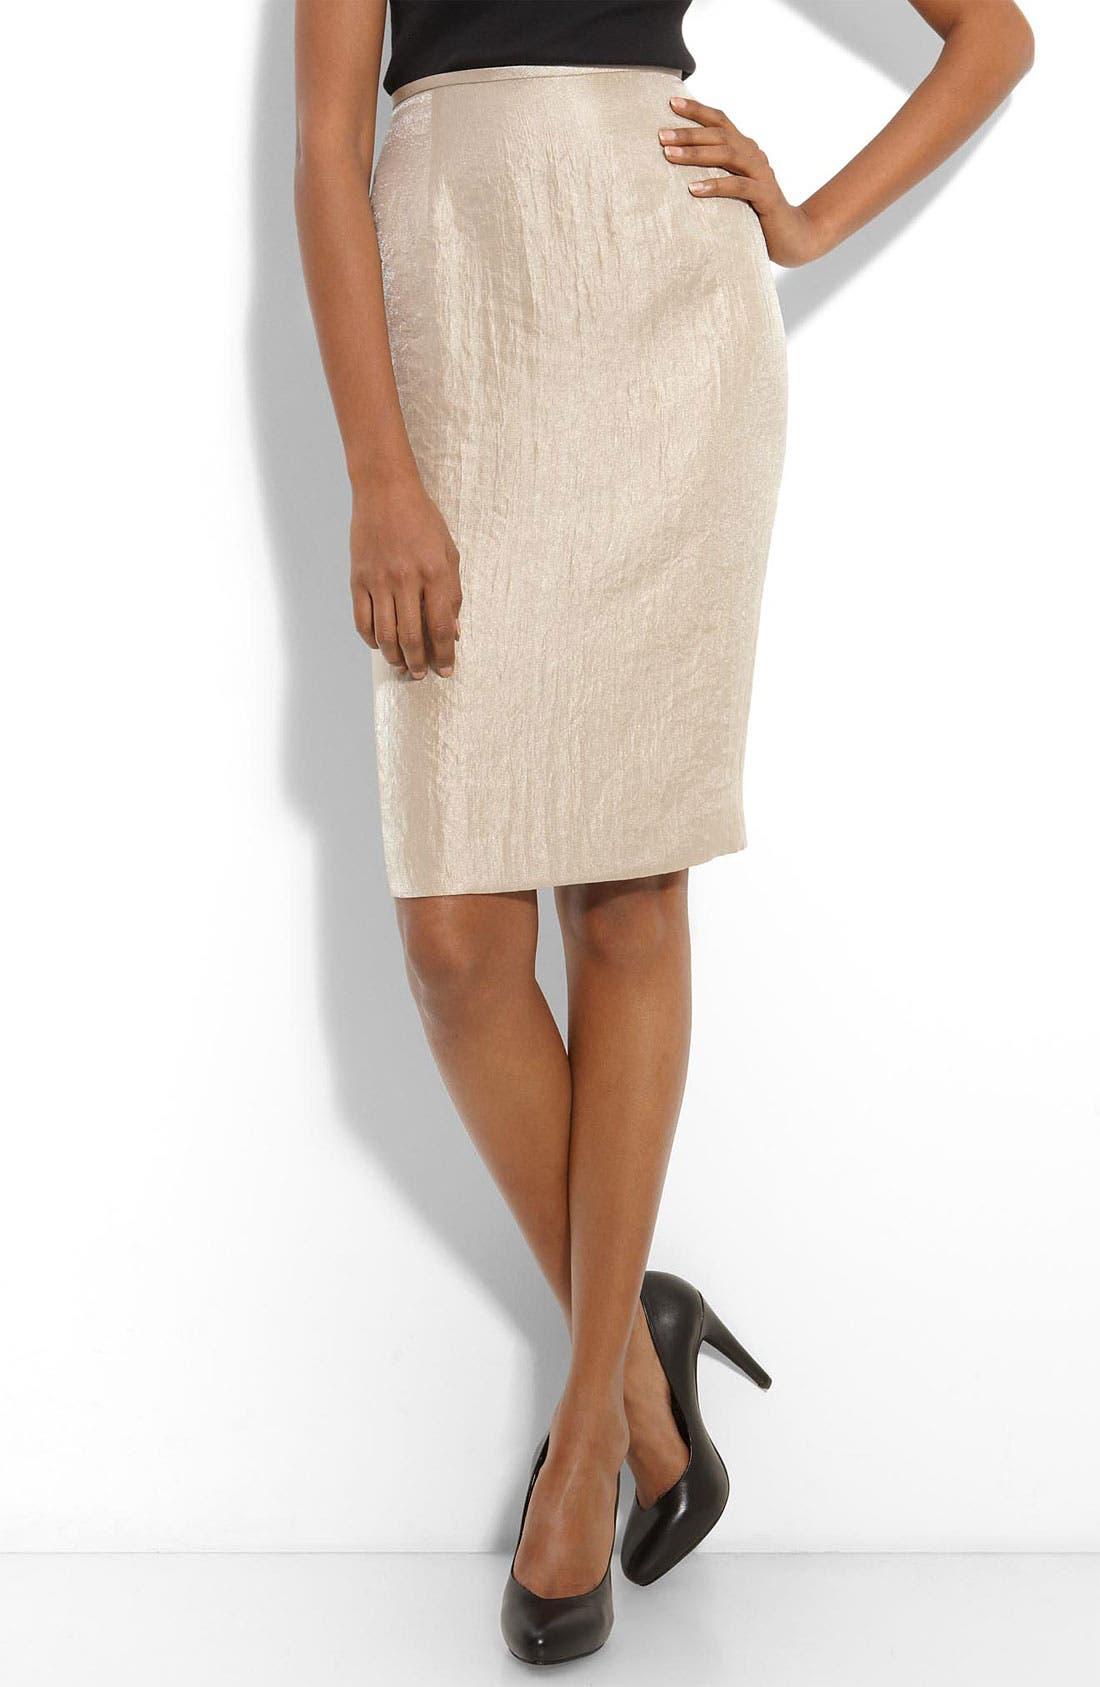 Alternate Image 1 Selected - Adrianna Papell Metallic Textured Pencil Skirt (Petite)